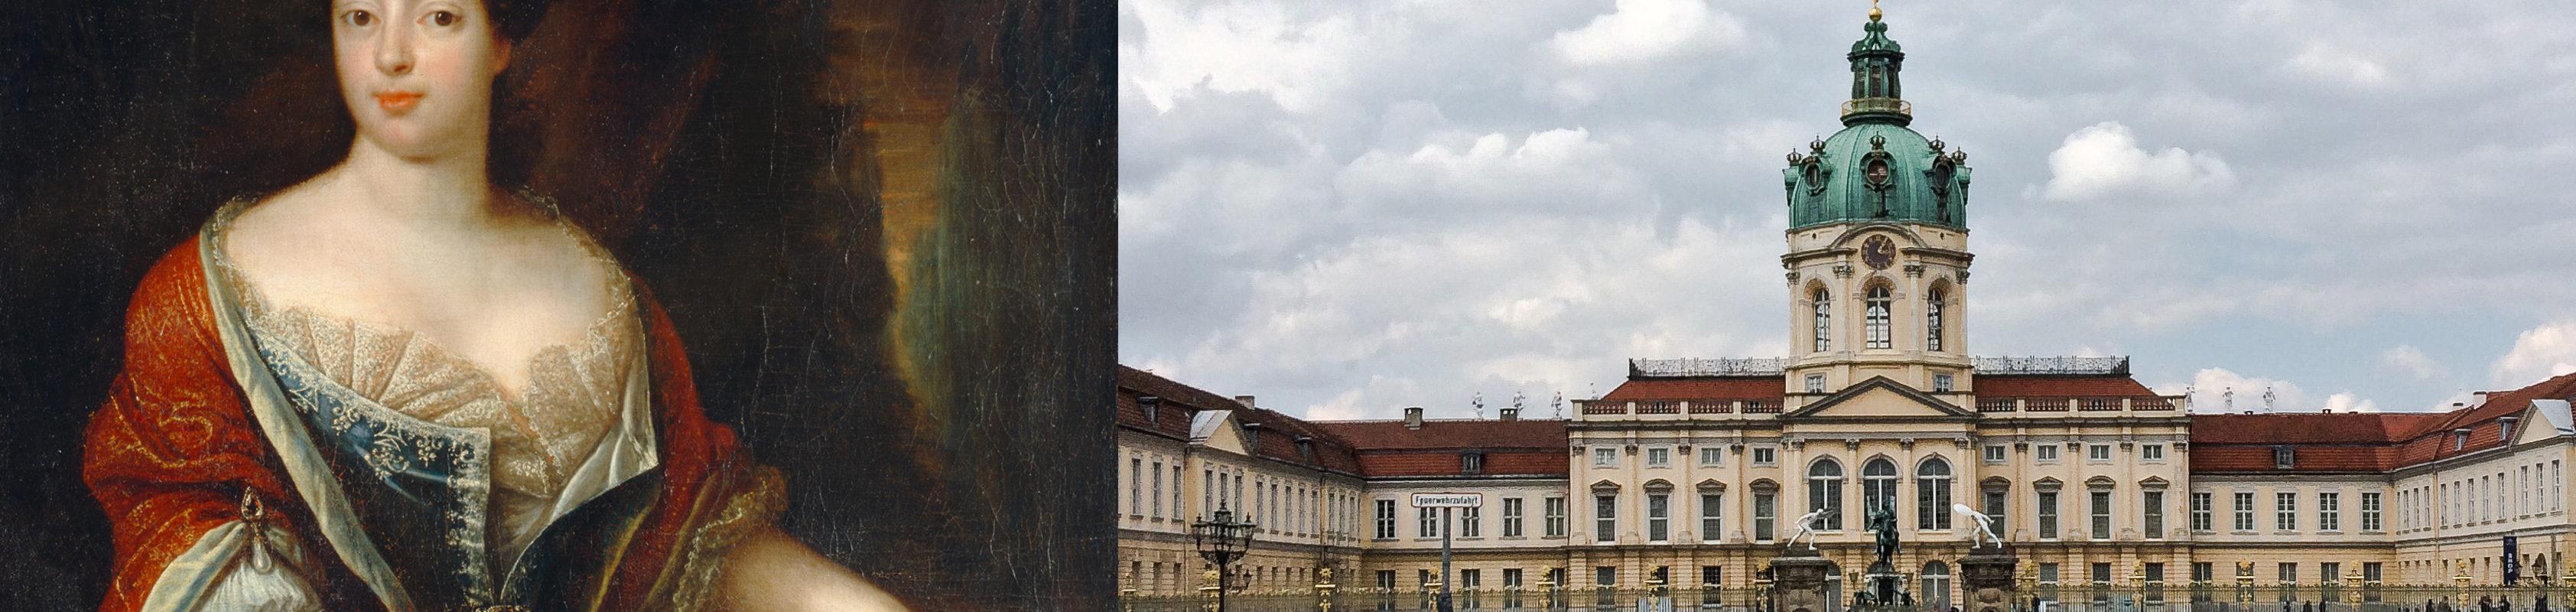 Header_Sophie Charlotte_Schloss Charlottenburg 2